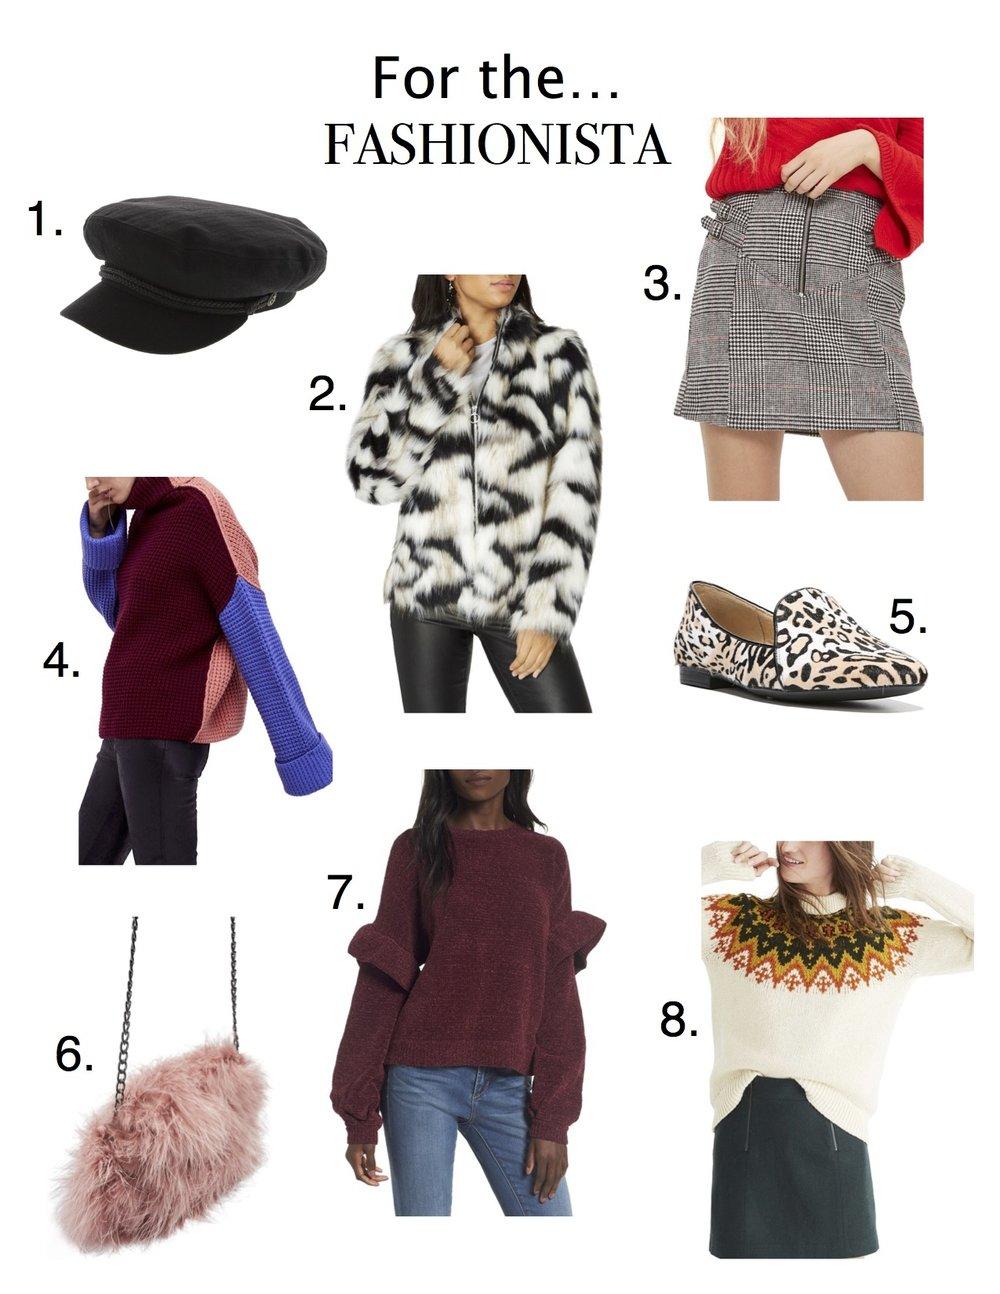 Fashionista Gift Guide.jpg